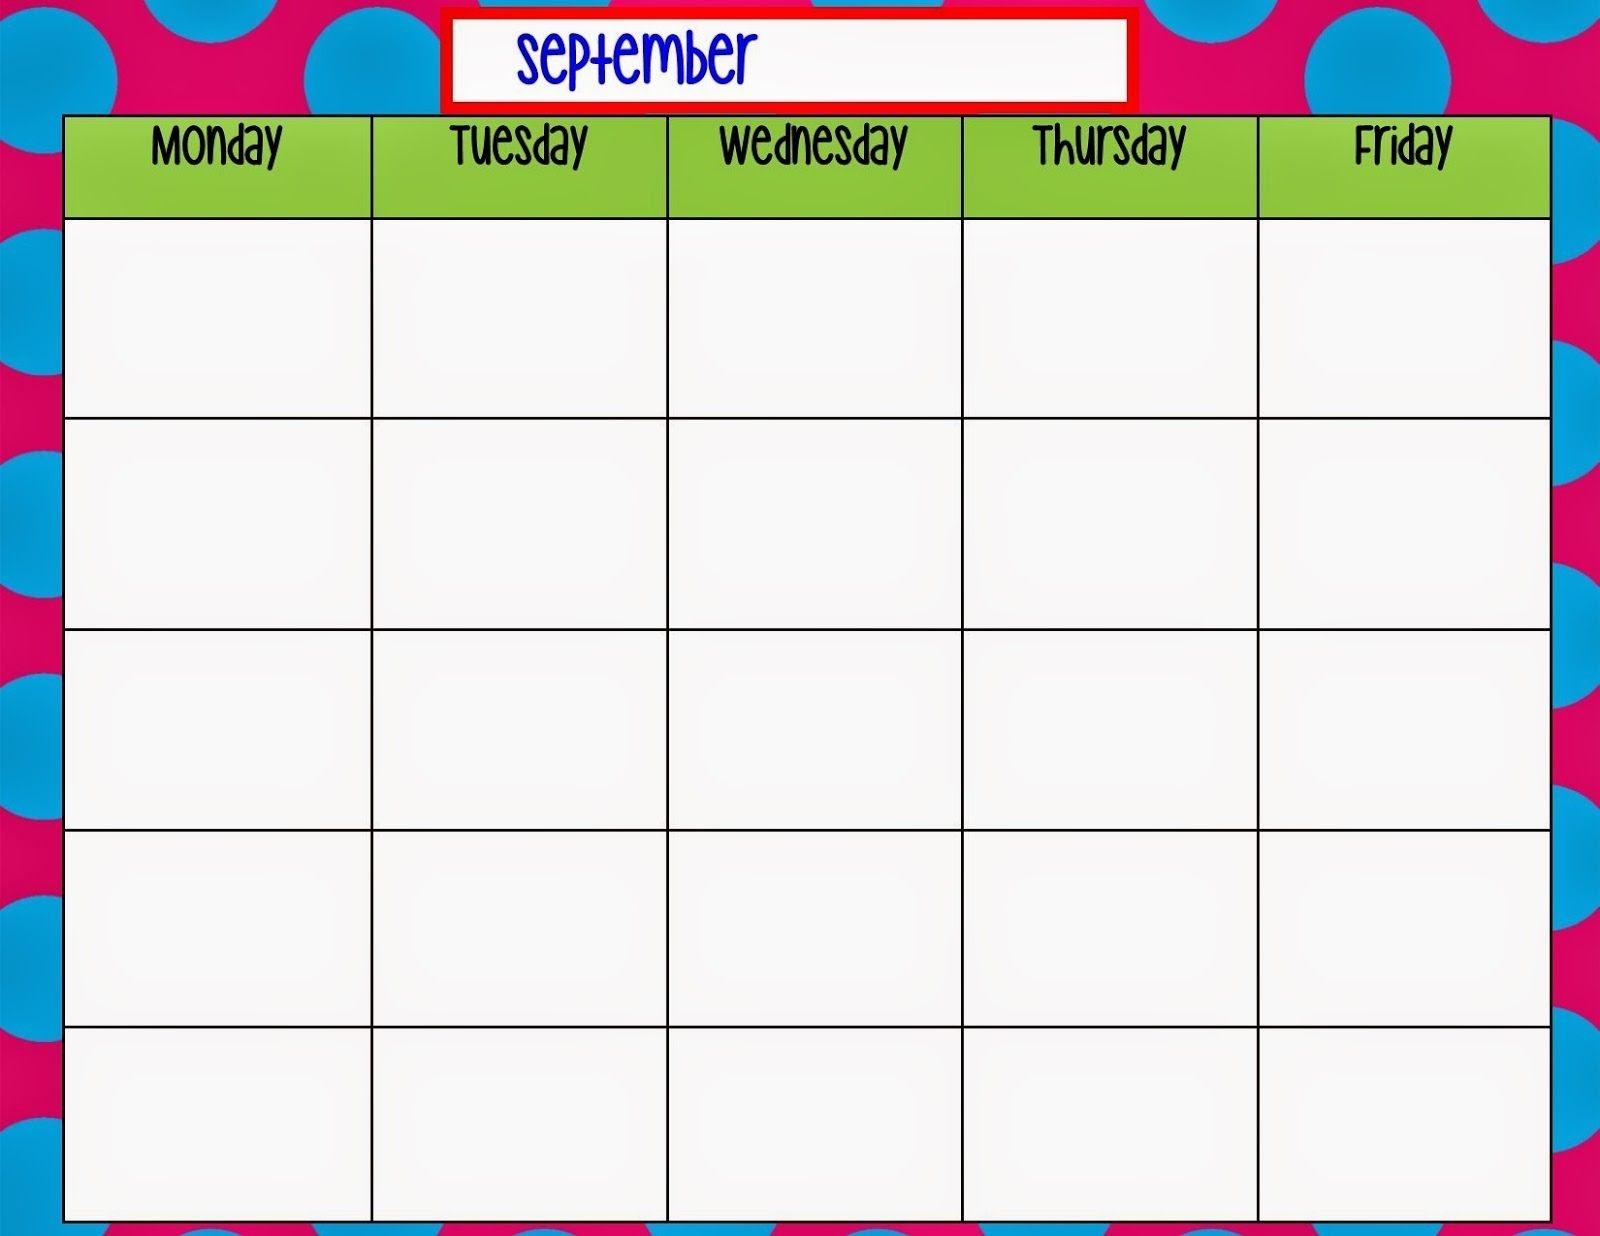 Monday Through Friday Calendar Template | Preschool | Weekly-Monday Wednesday Friday Schedule Template